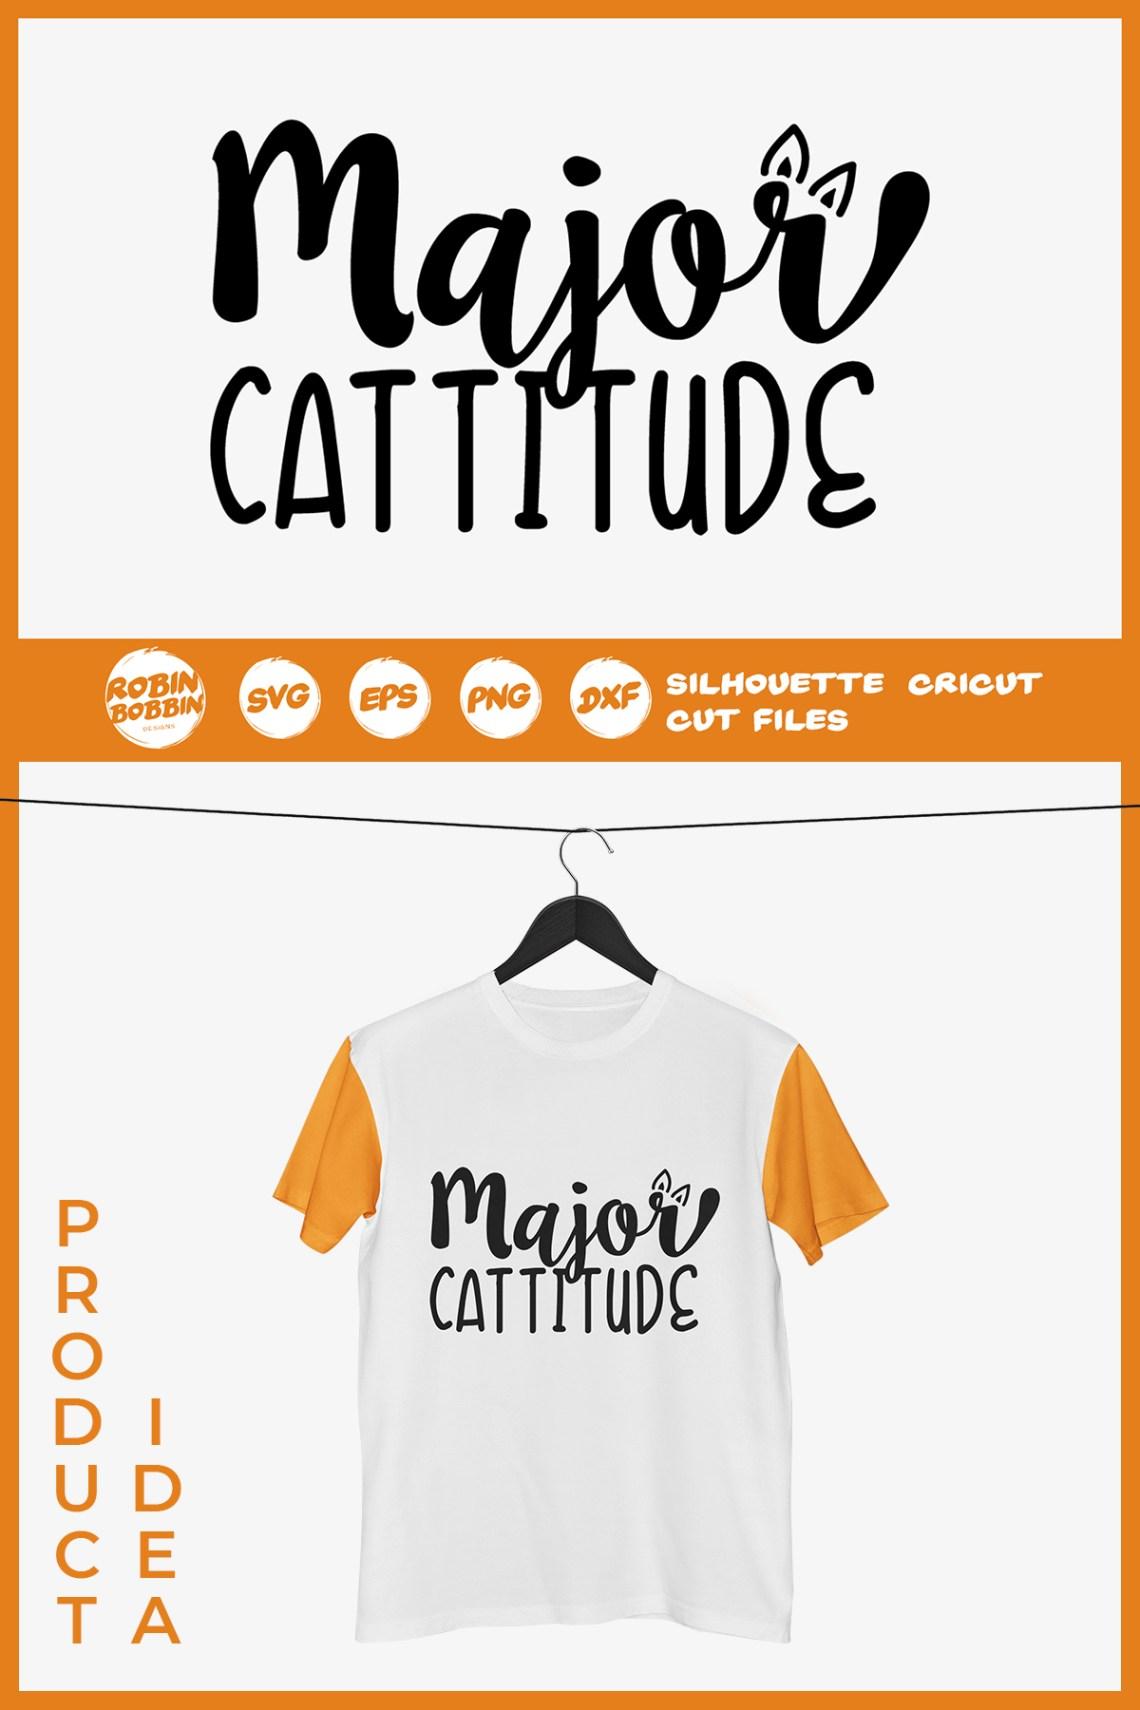 Download Major Cattitude SVG - Cat Lover SVG (293264)   Cut Files ...